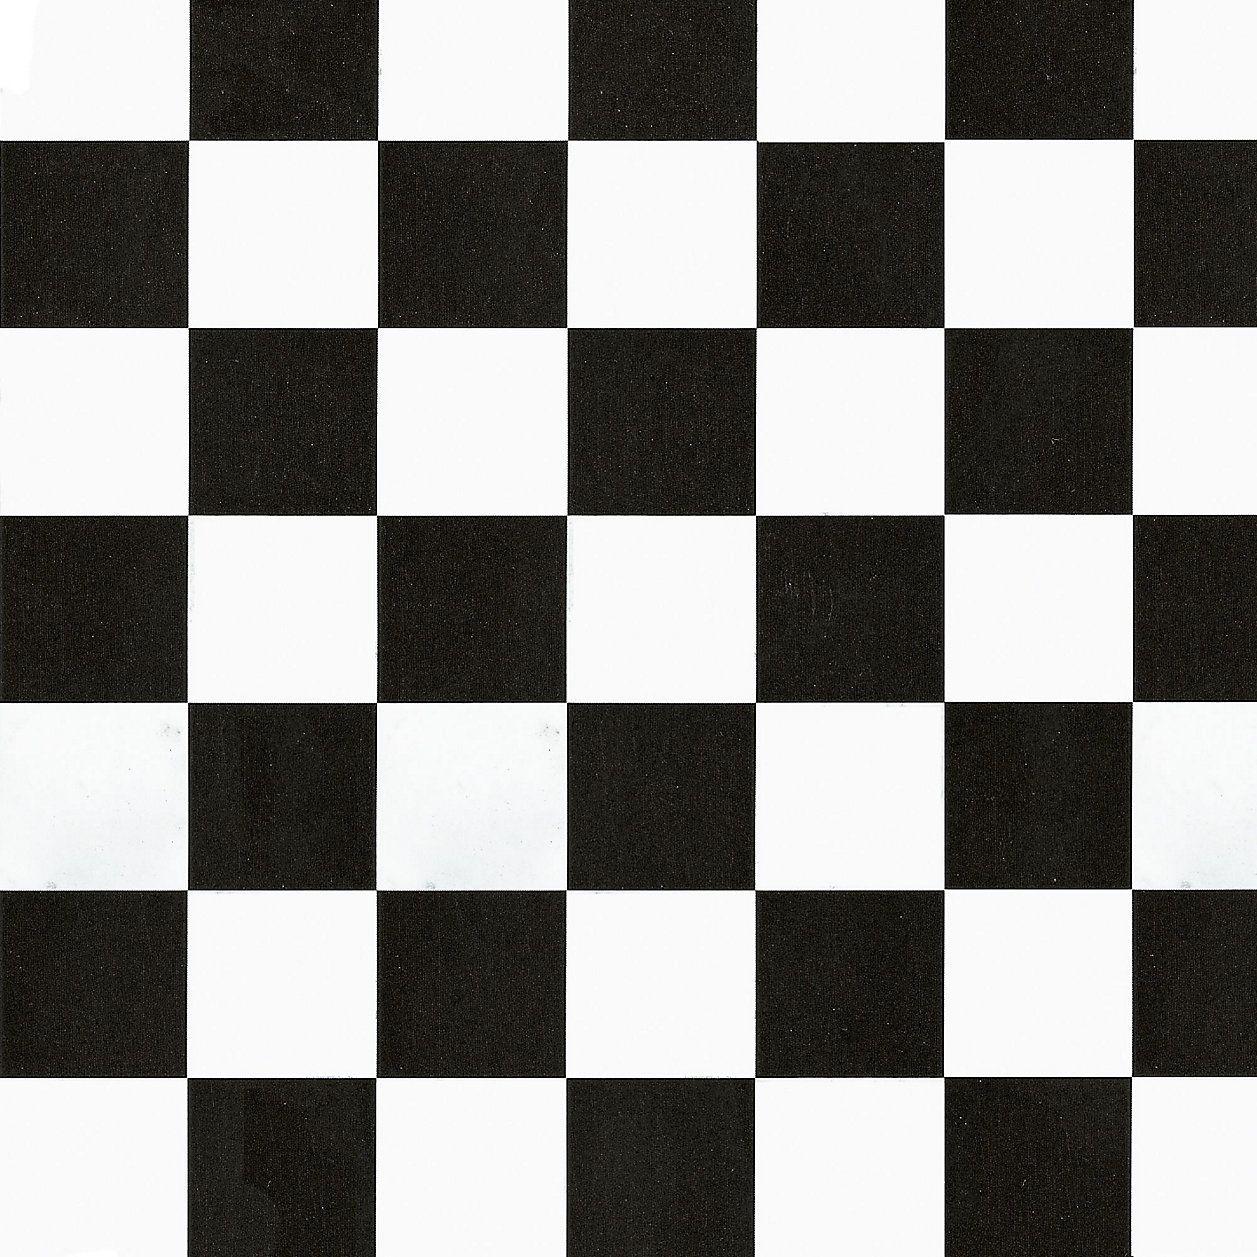 D C Fix Checkerboard Black White Self Adhesive Film L 2m W 450mm In 2020 Checkerboard Checkerboard Pattern Diy Store